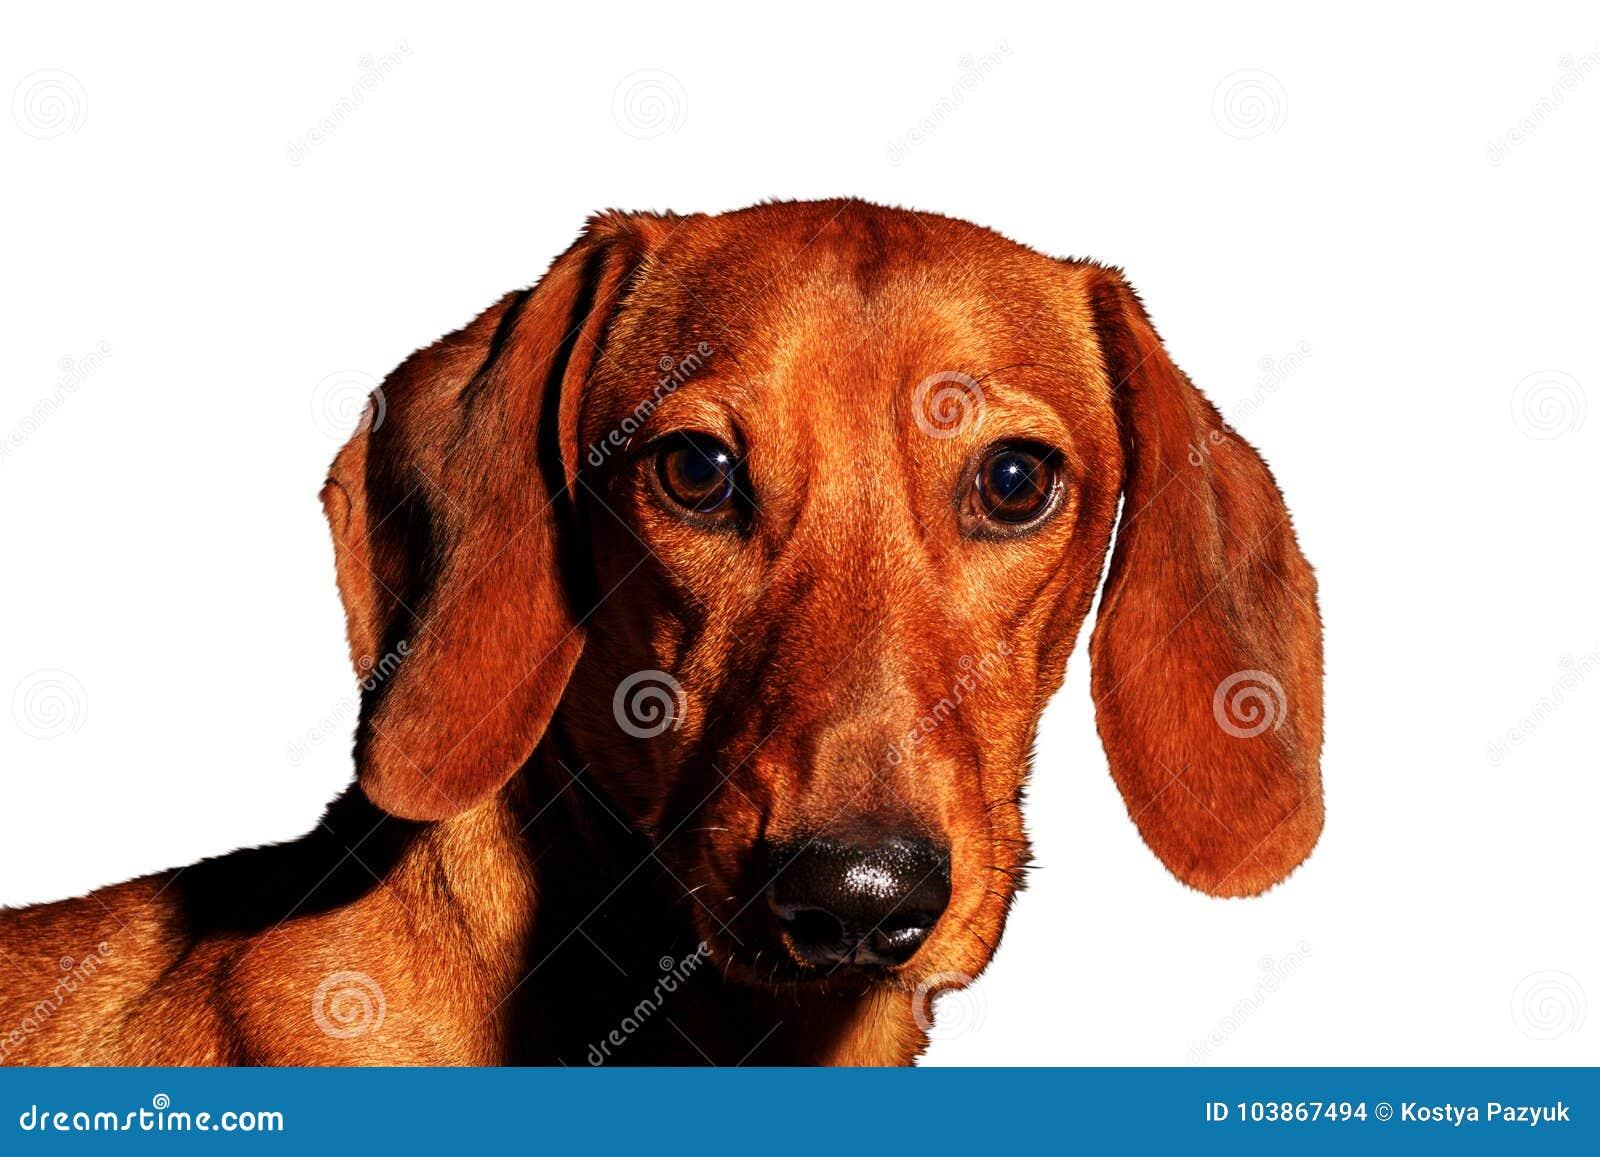 Röd hundstående av ett årssymbol på en vit bakgrund